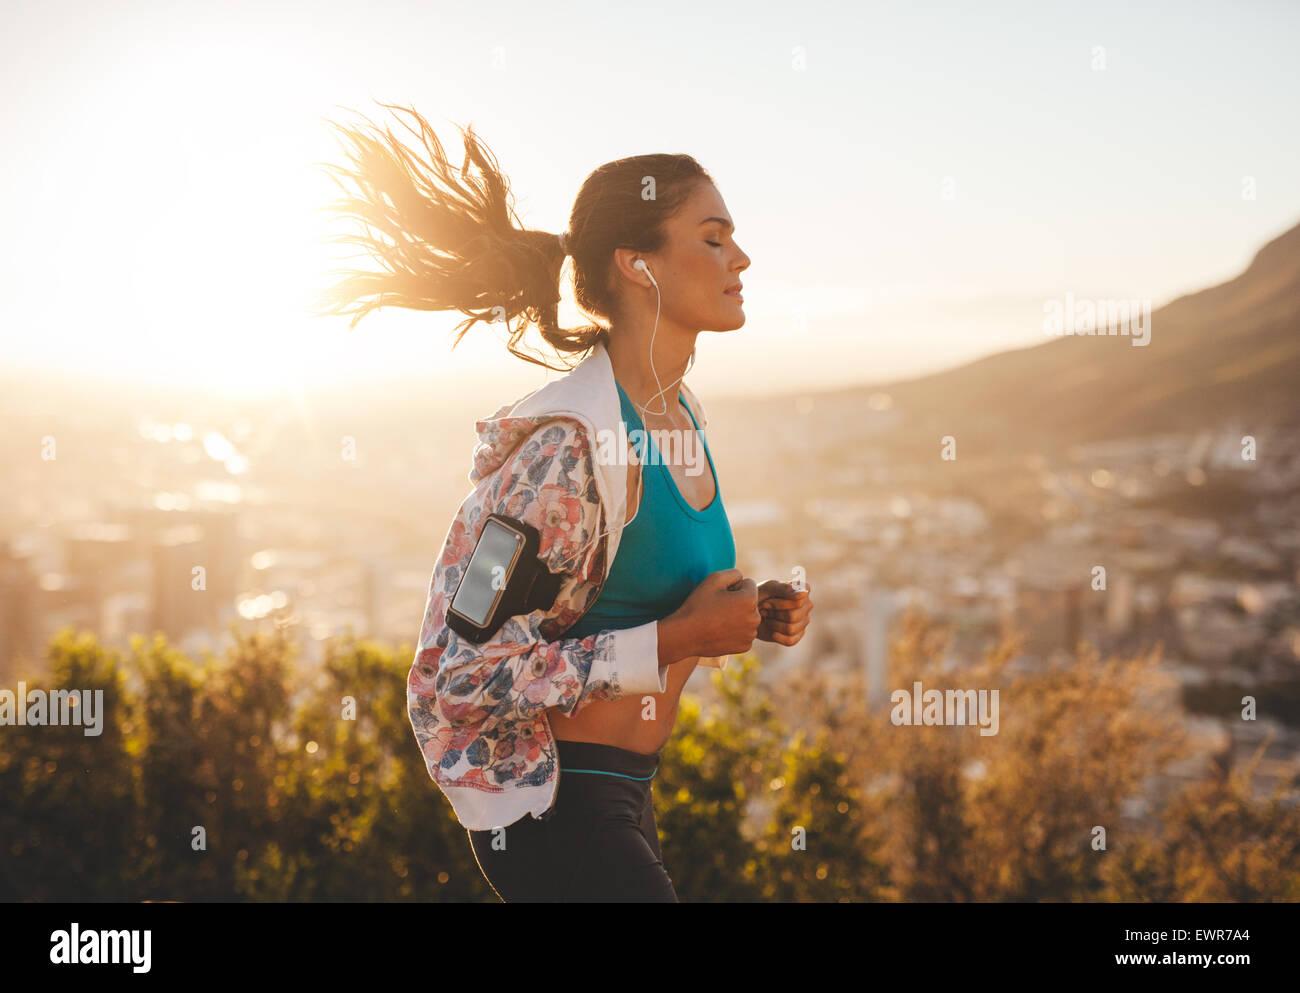 Retrato de joven hermosa para correr en un caluroso día de sol. Caucásica modelo femenino trotar al aire Imagen De Stock